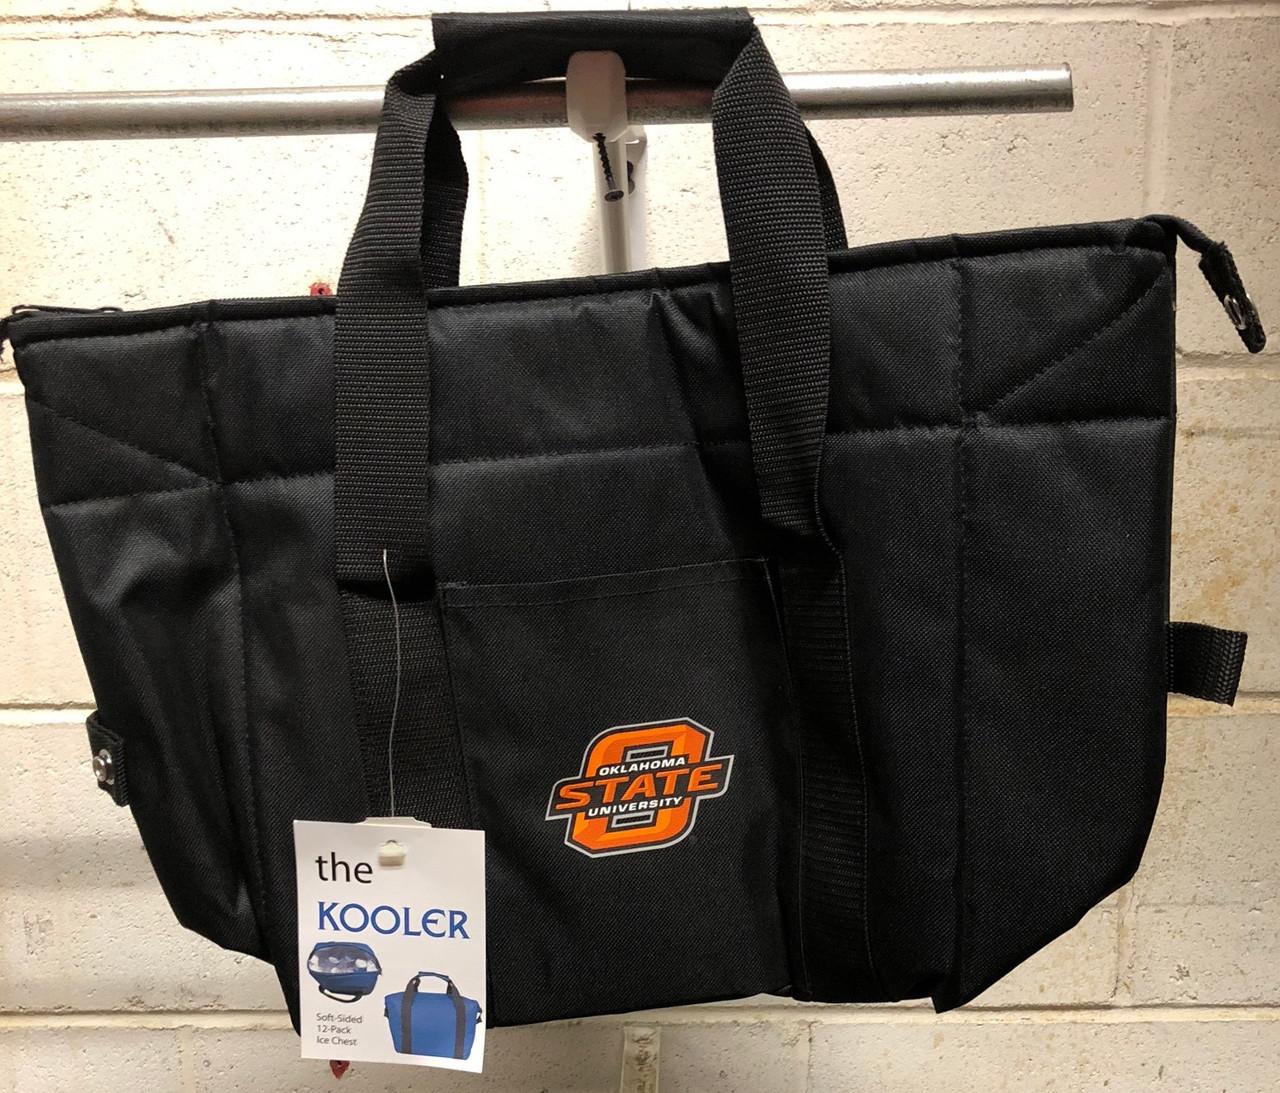 Oklahoma State Cowboys Kooler Bag 12 Pack